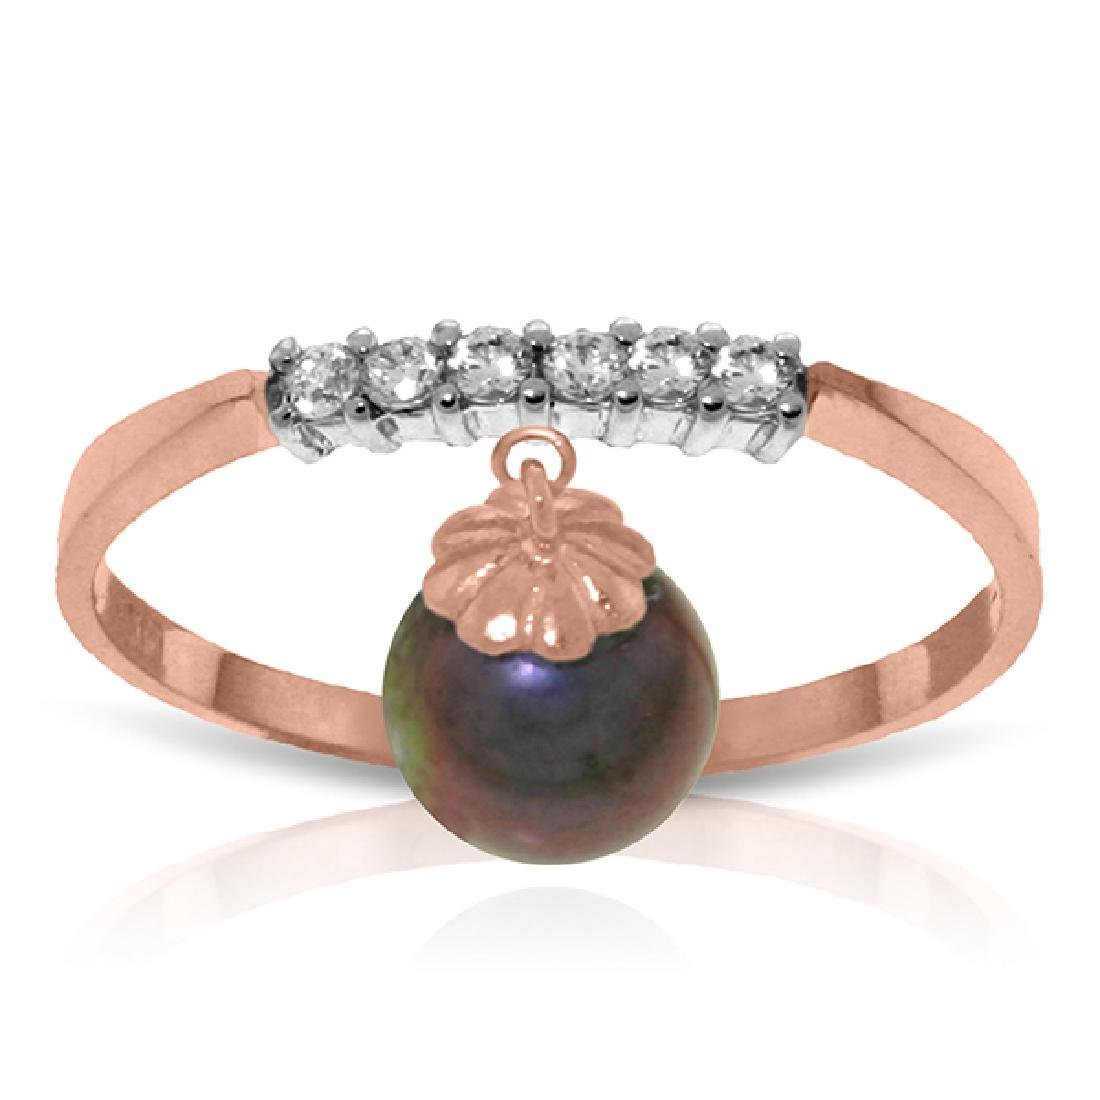 Genuine 2.1 ctw Black Pearl & Diamond Ring Jewelry 14KT